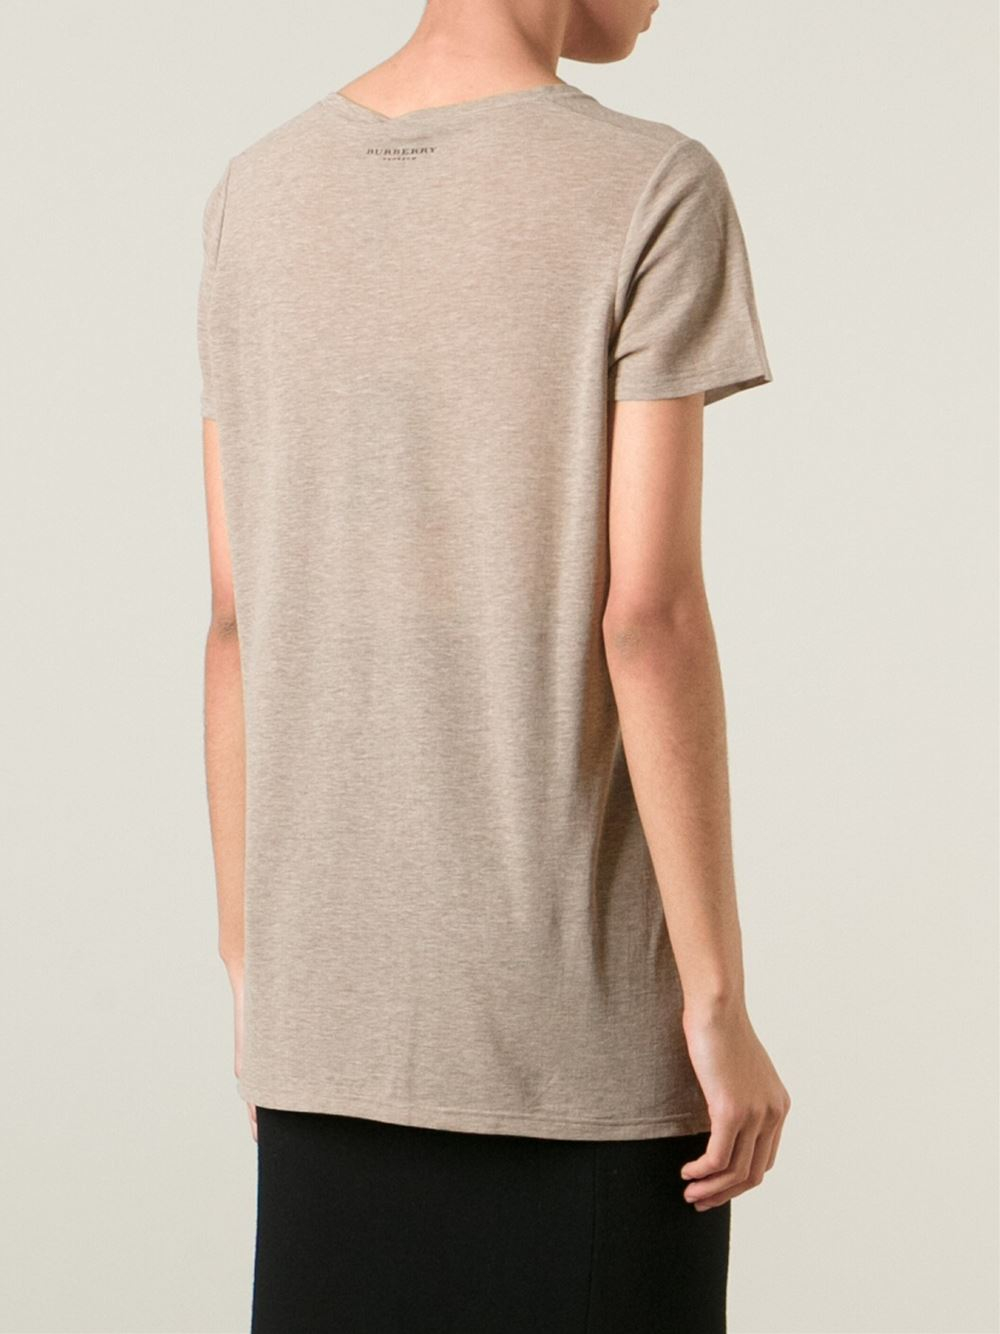 burberry prorsum plum print t shirt in natural lyst. Black Bedroom Furniture Sets. Home Design Ideas